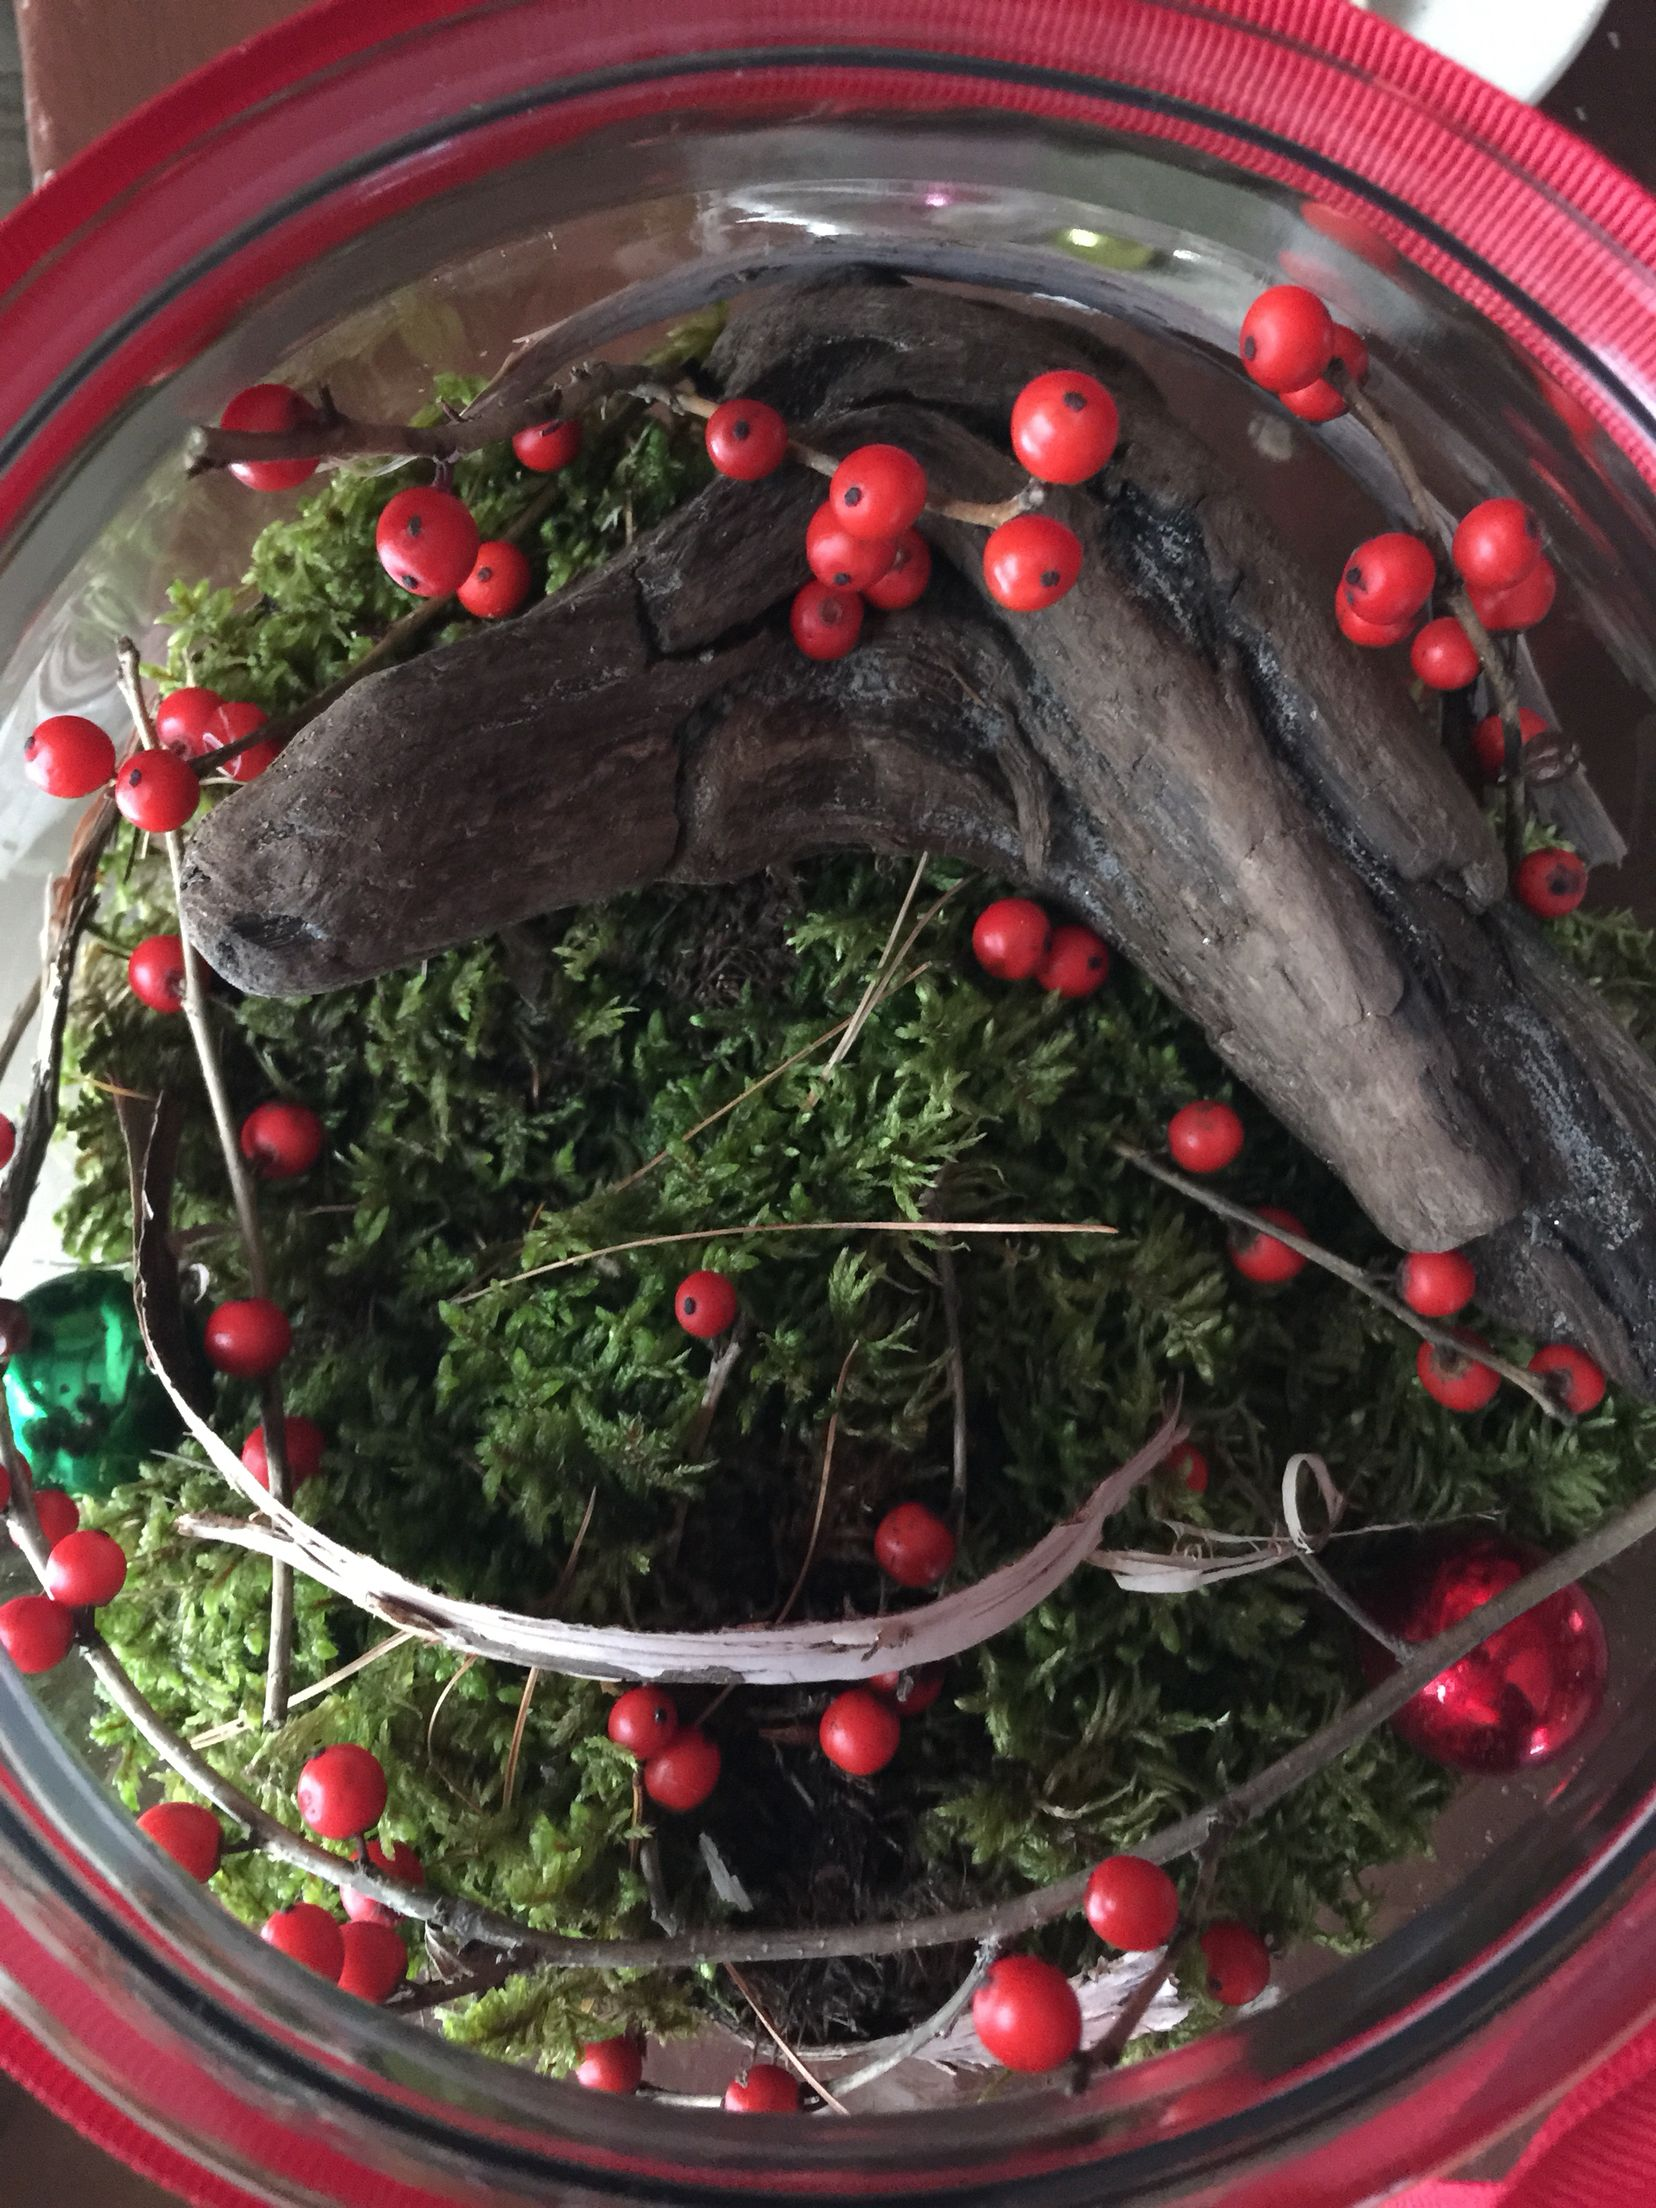 great hostess gift...fish bowl layered with tiny stones, sand, fresh moss etc. festive & fun!